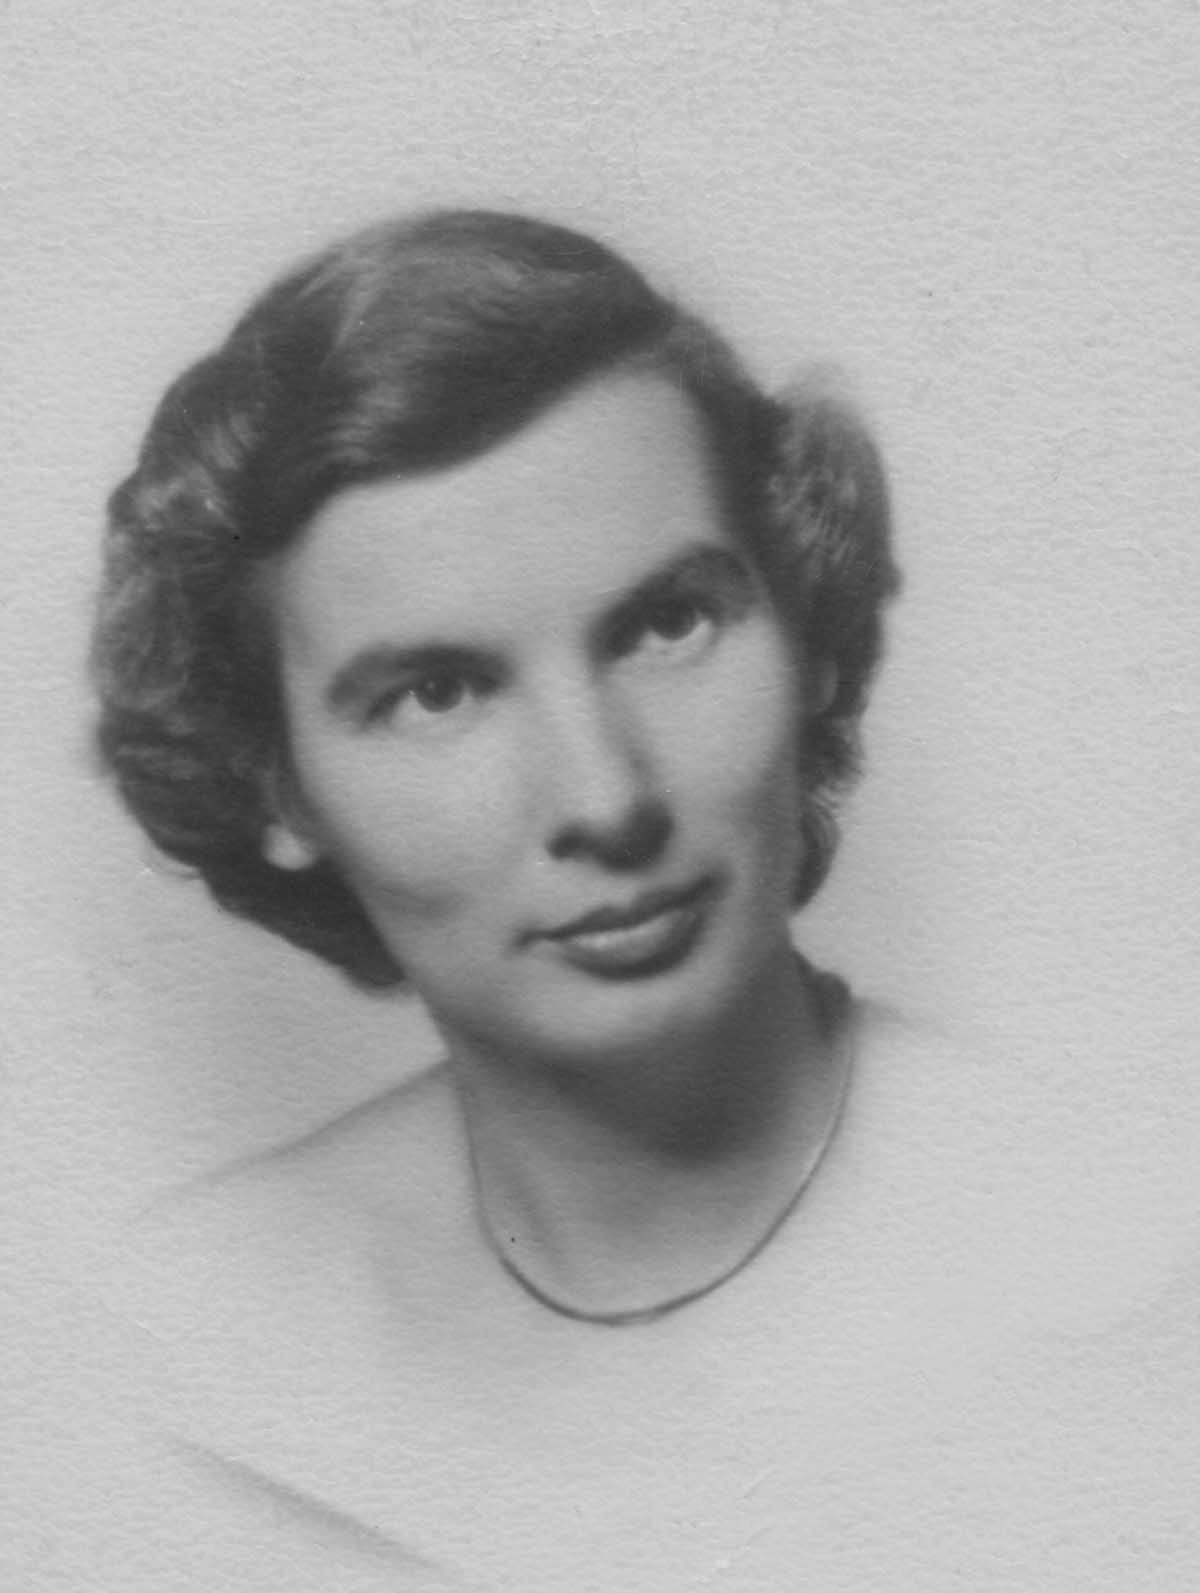 Mary Lee Hayek